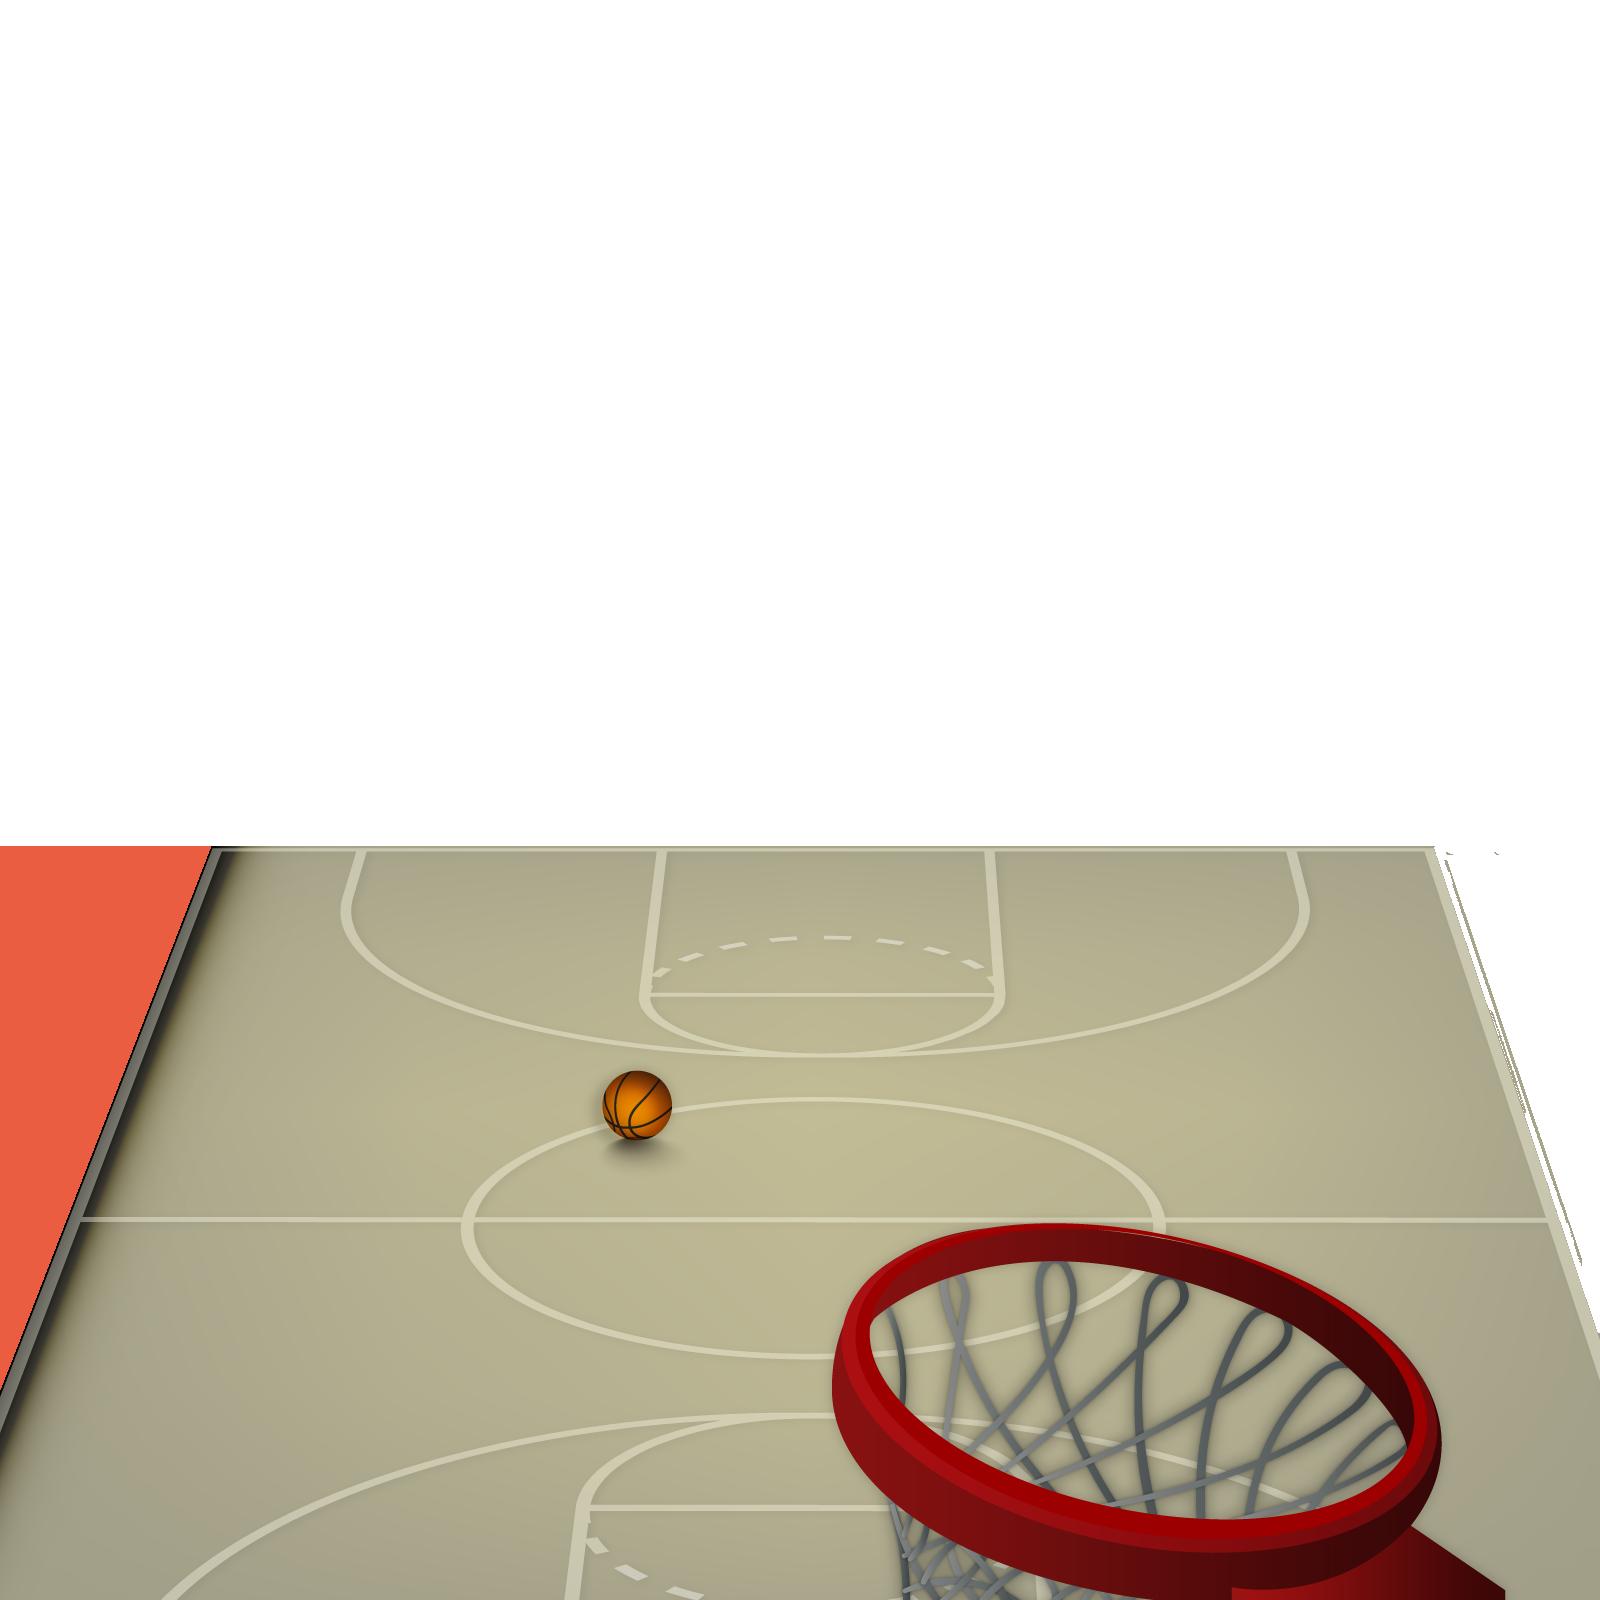 1600x1600 Basketball Court Athletics Field